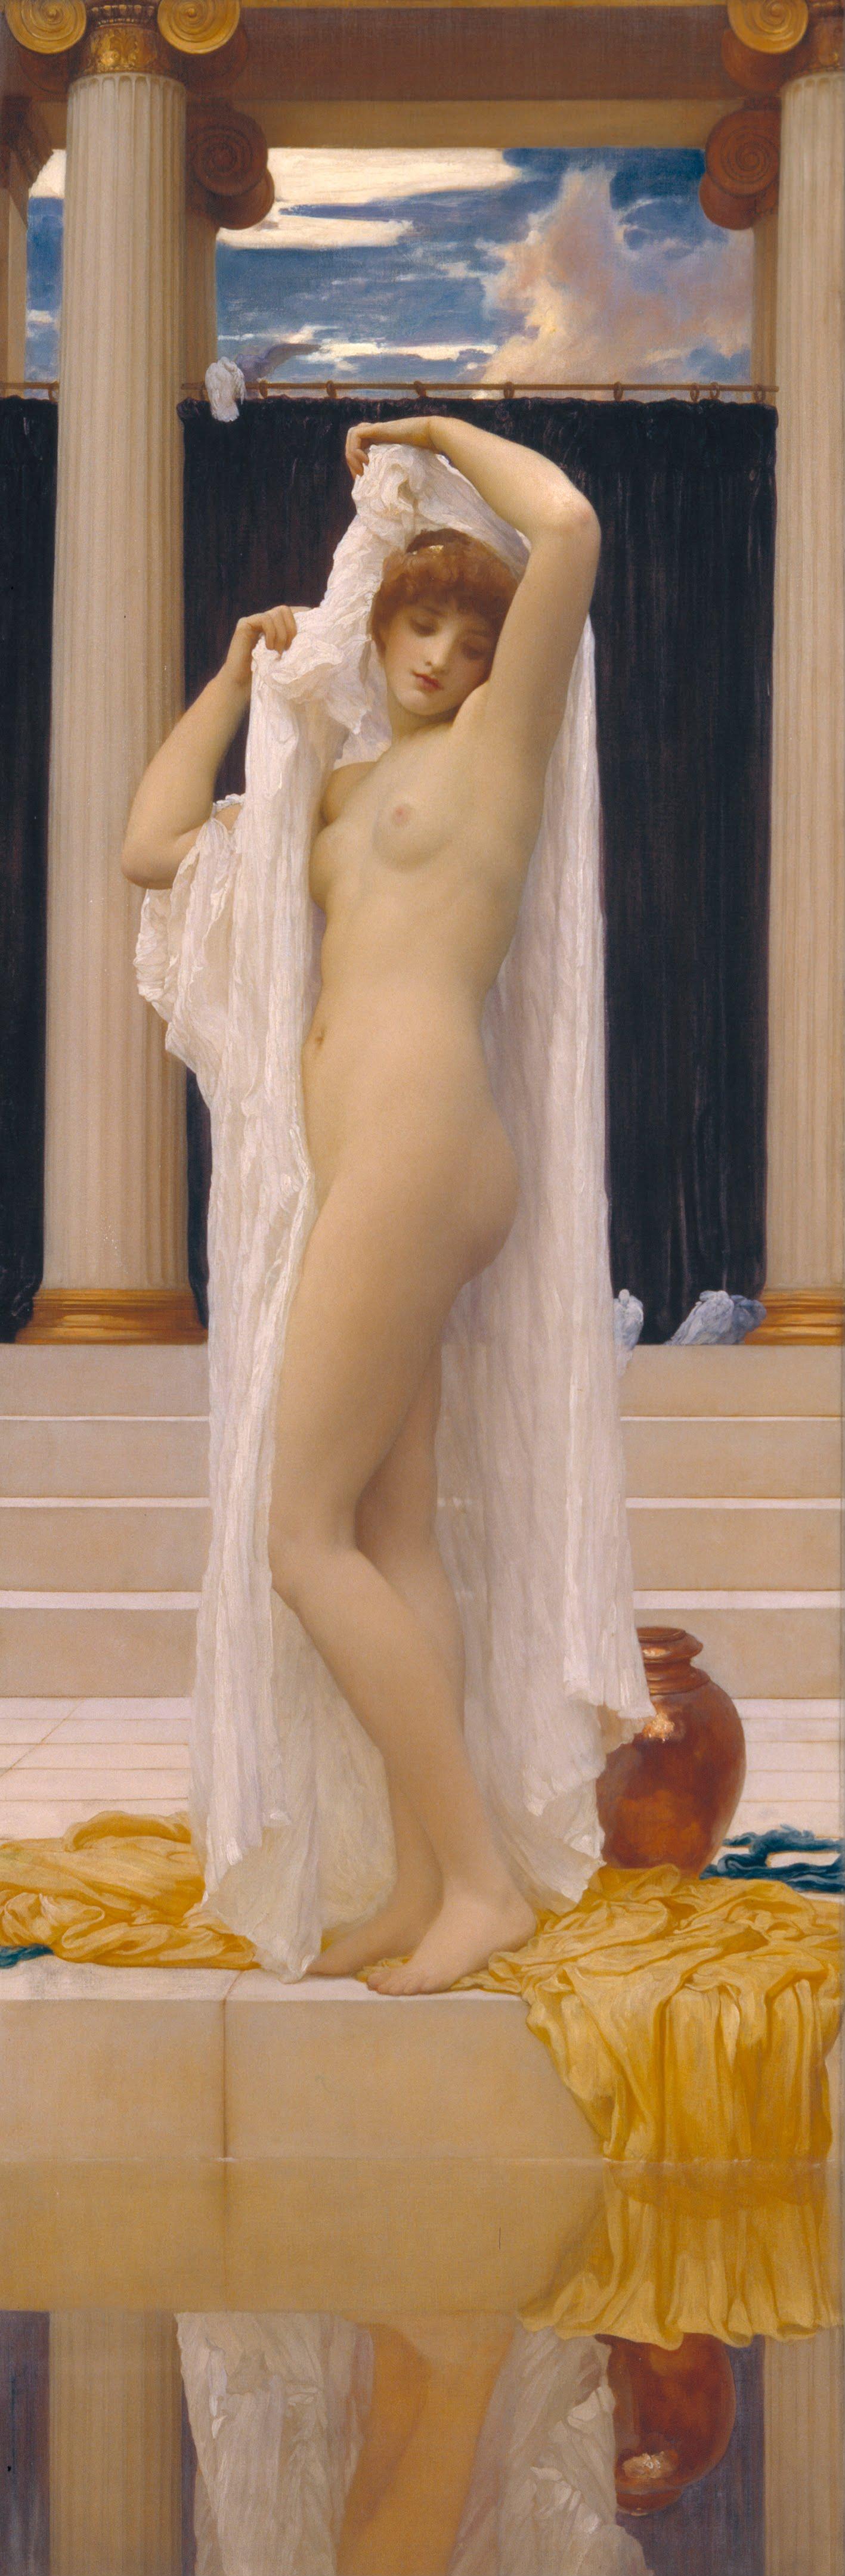 Frederick Leighton, 1830-1896. Купание Психеи. 189.2 х 62.2 см. Лондон, галерея Тейт